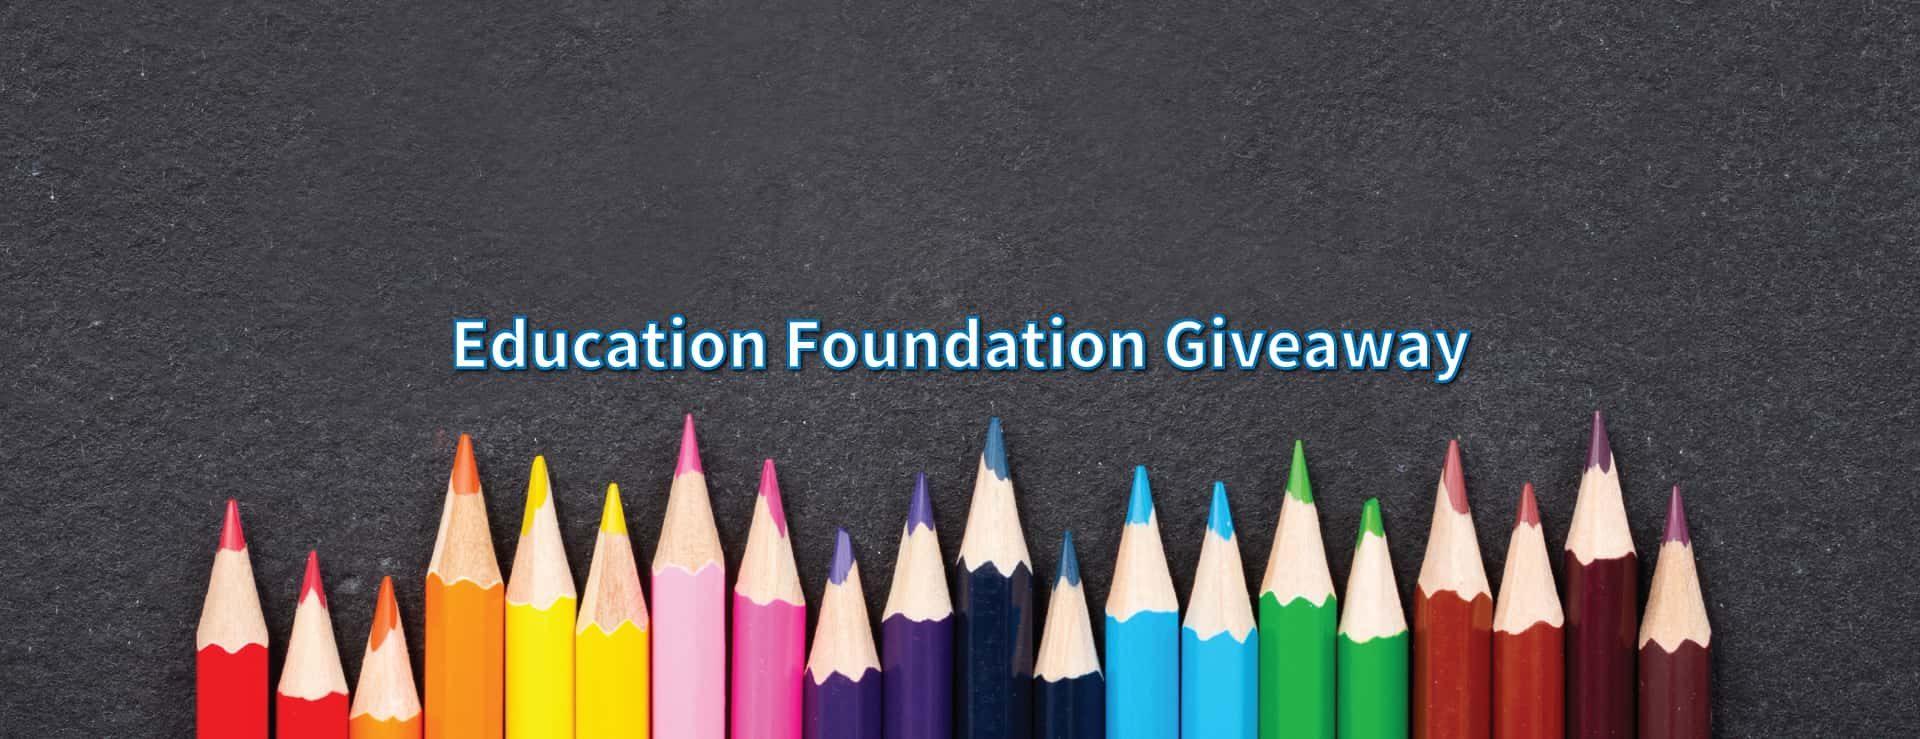 education-foundation-web-banner-min